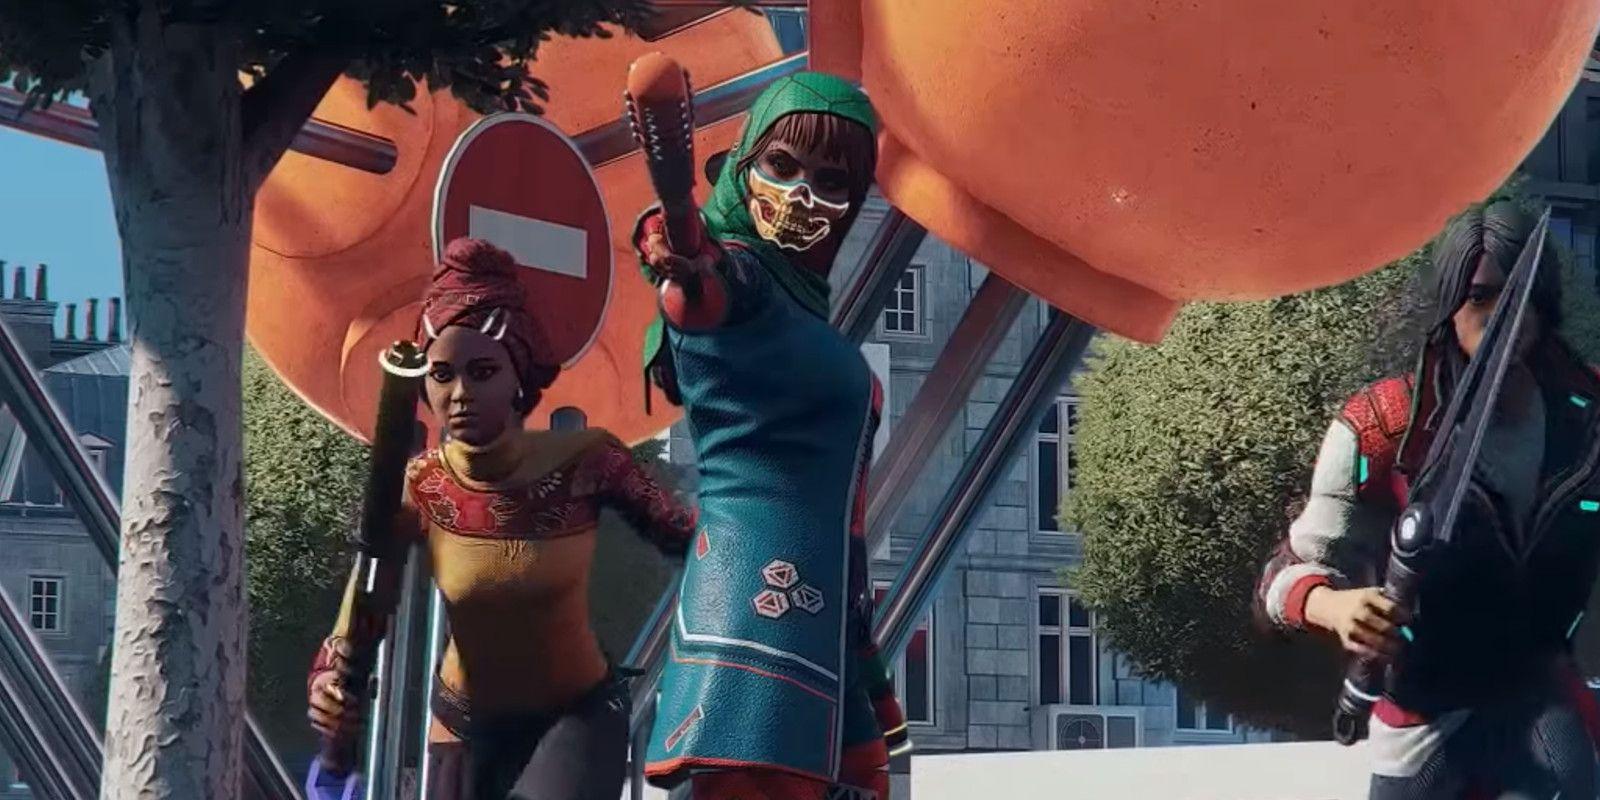 Hyper Scape: The Story Behind Ubisoft's Battle Royale, Explained